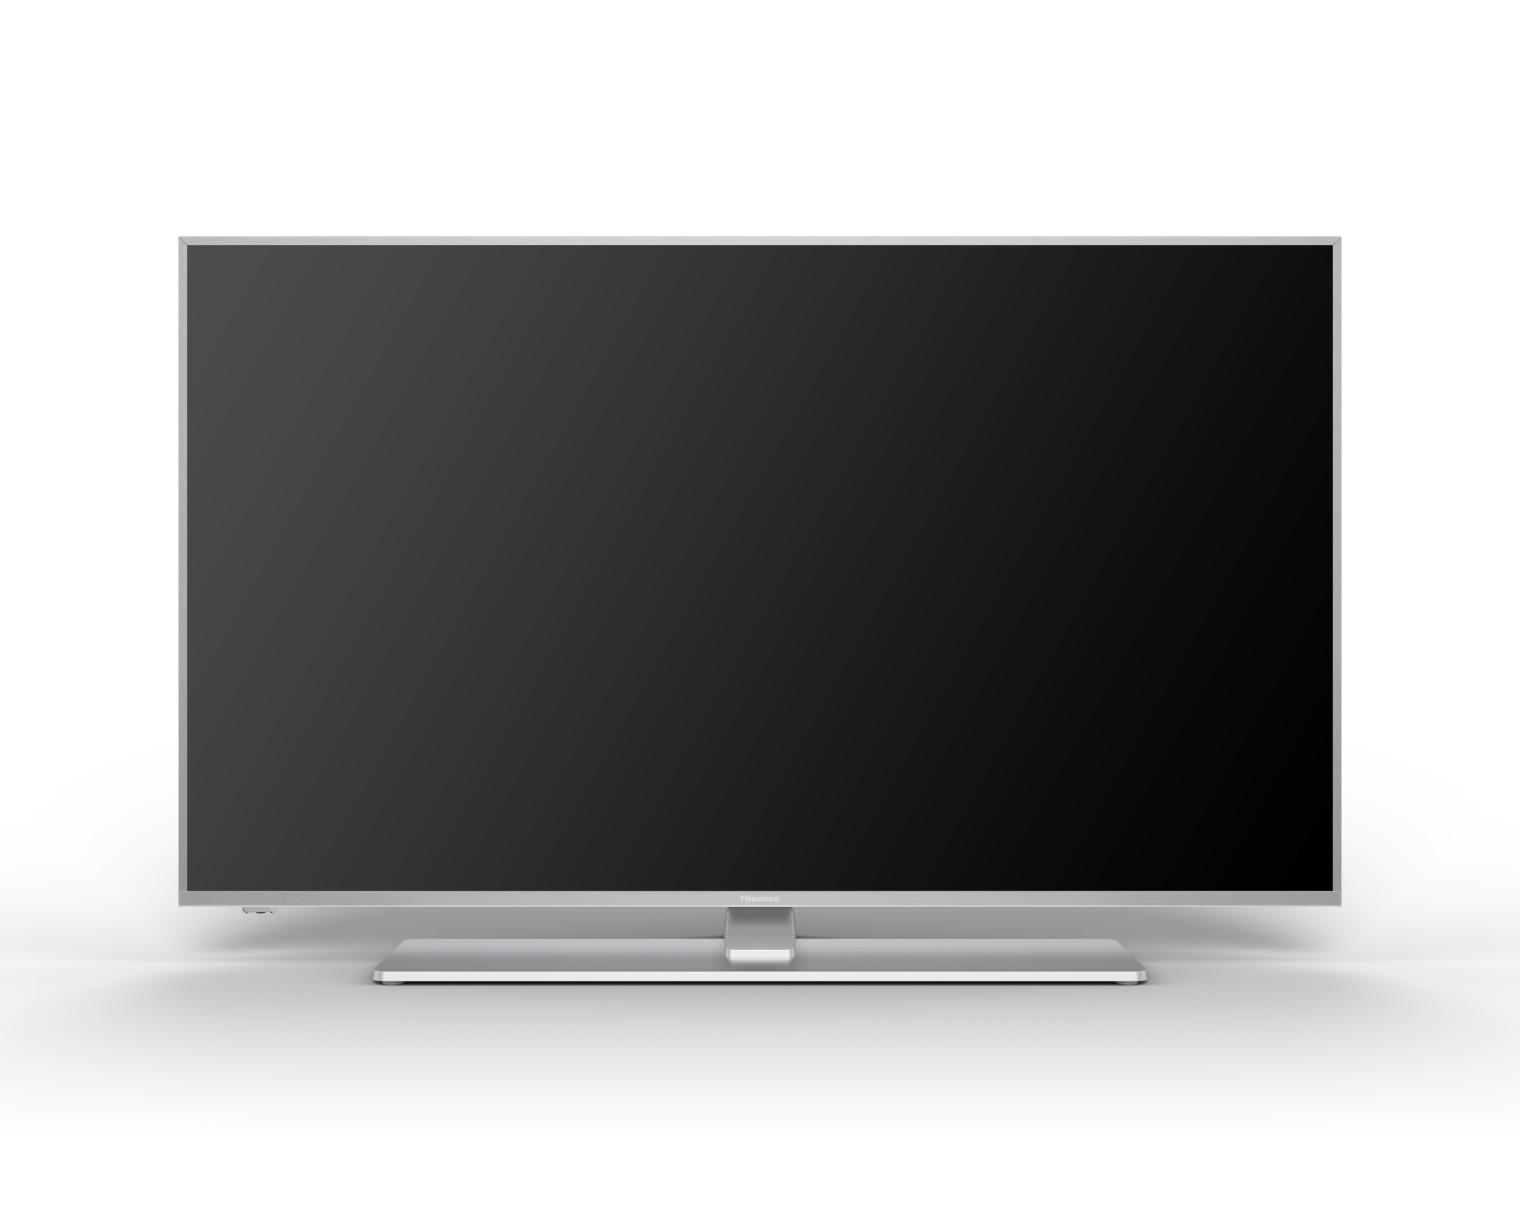 HISENSE UHD TV H55A6550/NL ZILVER